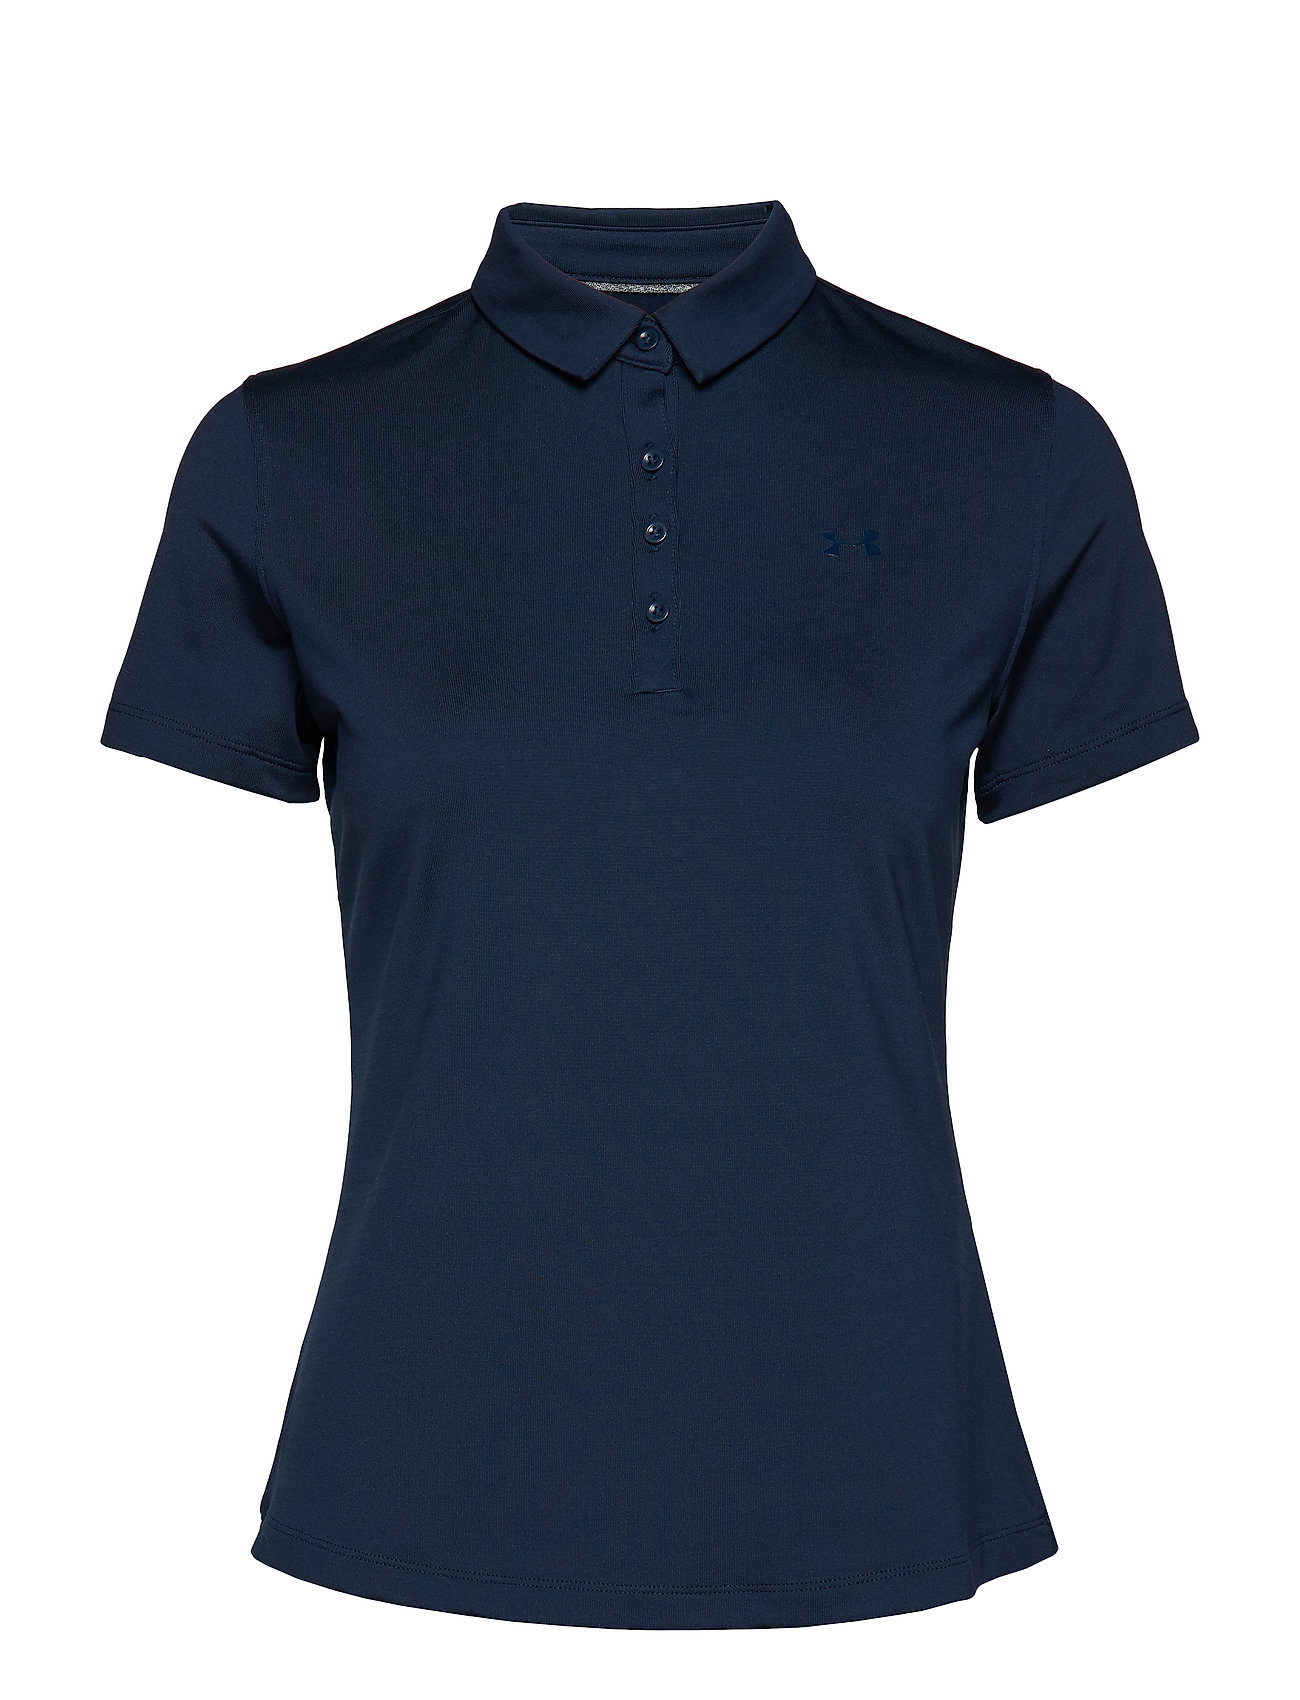 Under Armour Zinger Short Sleeve Polo - NAVY